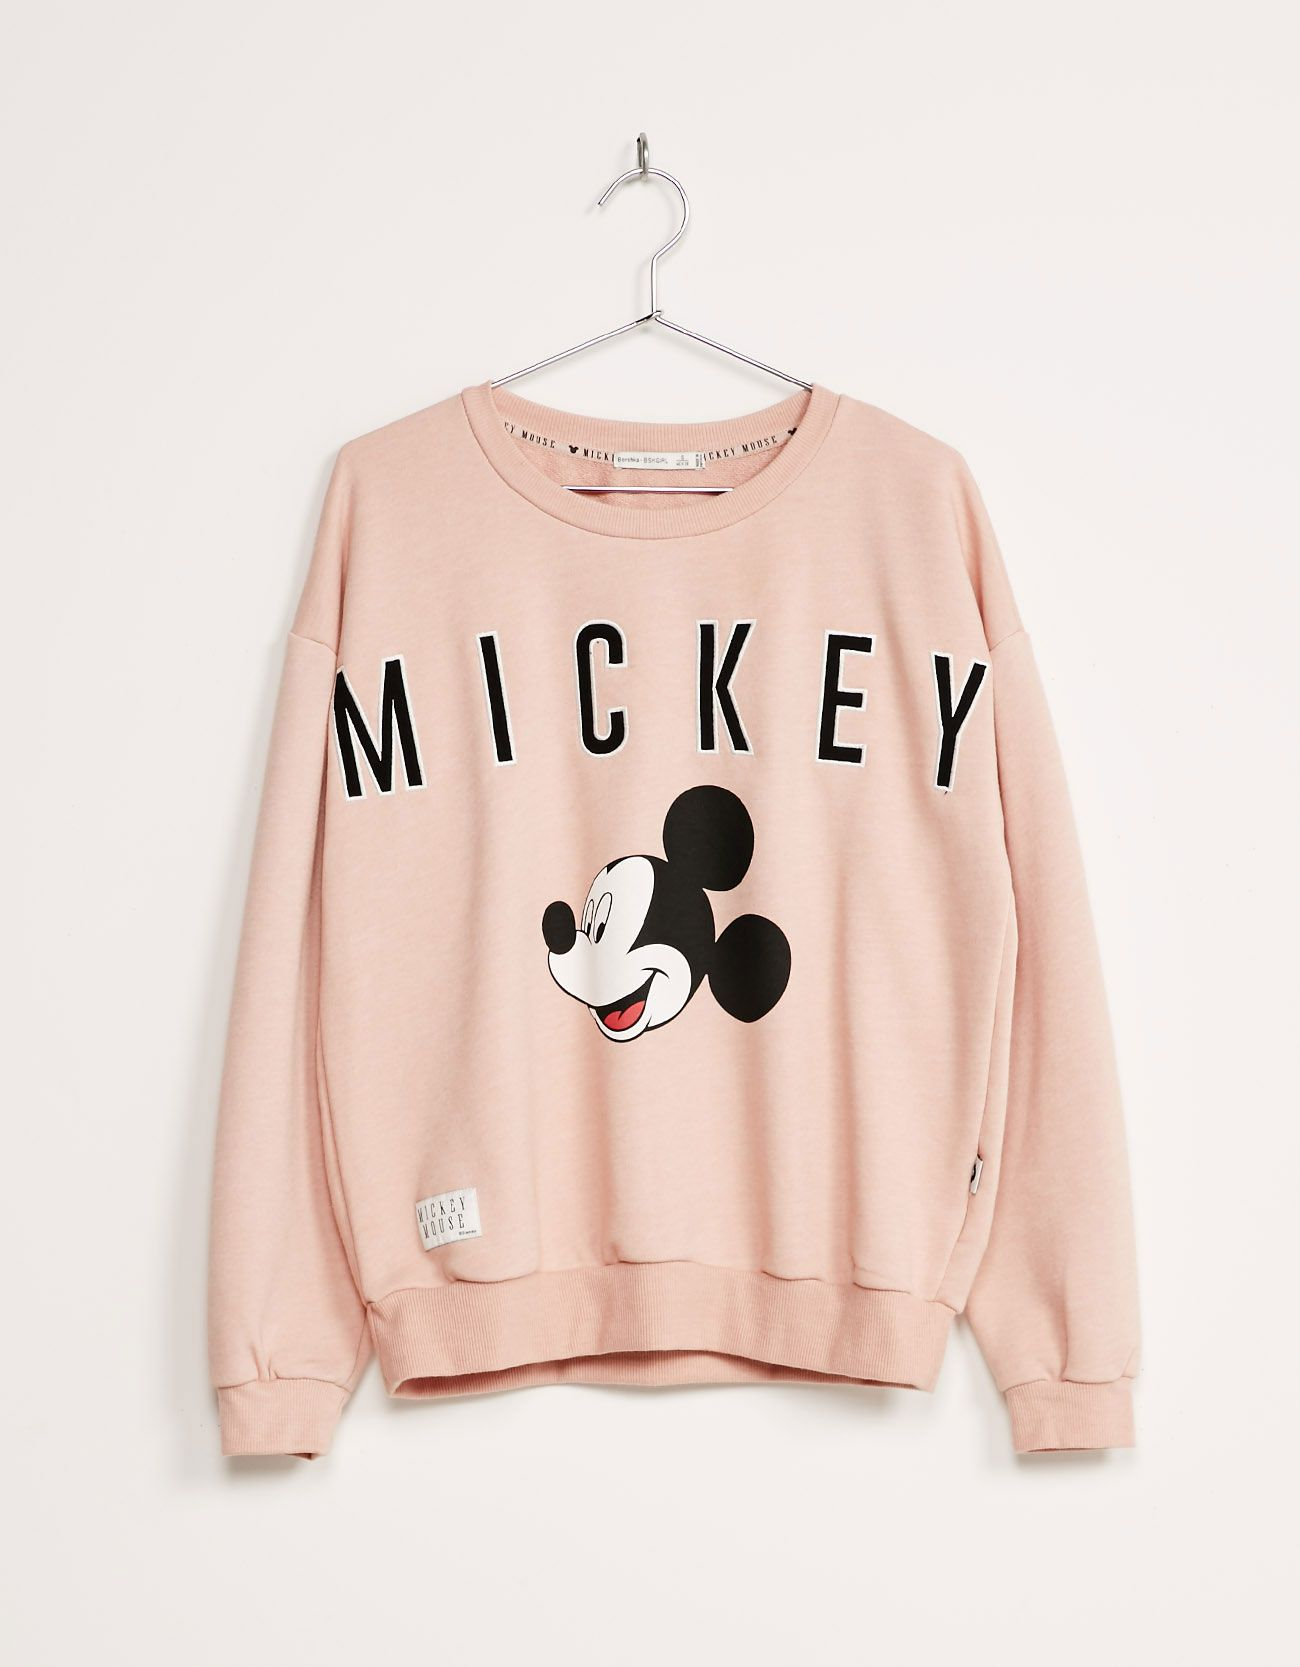 Bsk Mickey Sweatshirt Sweatshirts Bershka United Kingdom Doseofbblog Insta Twitter Pinterest Www Dos Cute Disney Outfits Disney Outfits Disneyland Outfits [ 1667 x 1300 Pixel ]